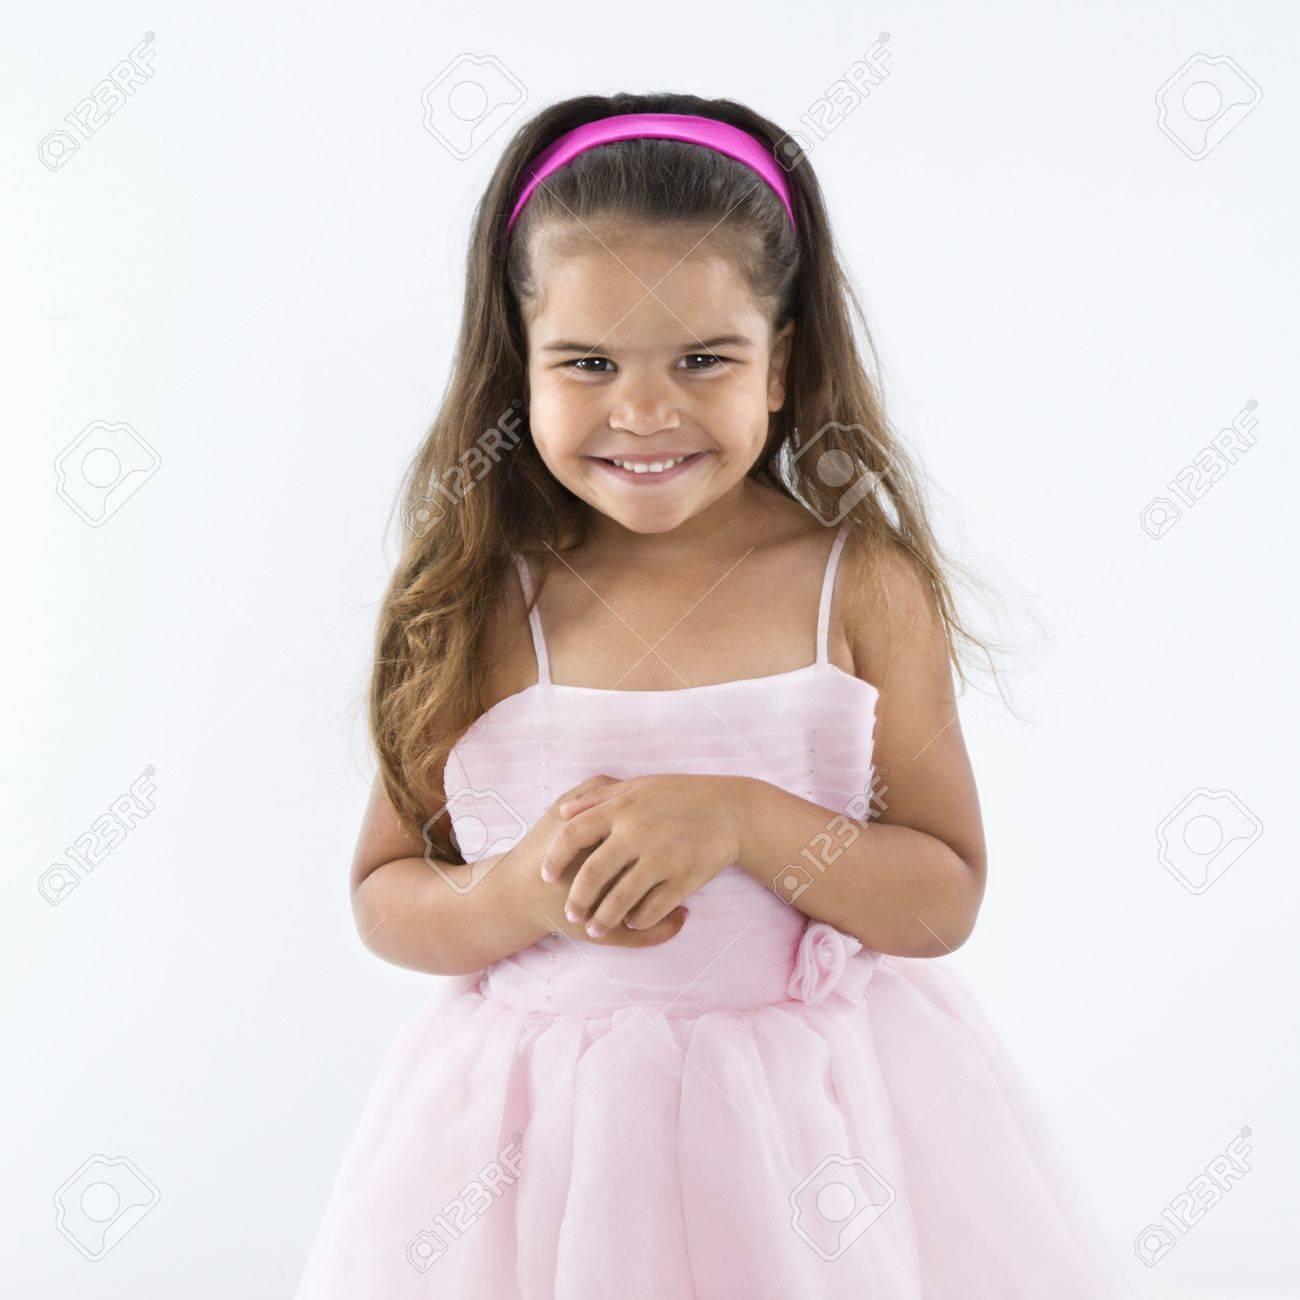 Cute little hispanic girl wearing pink dress smiling. Stock Photo - 3569347